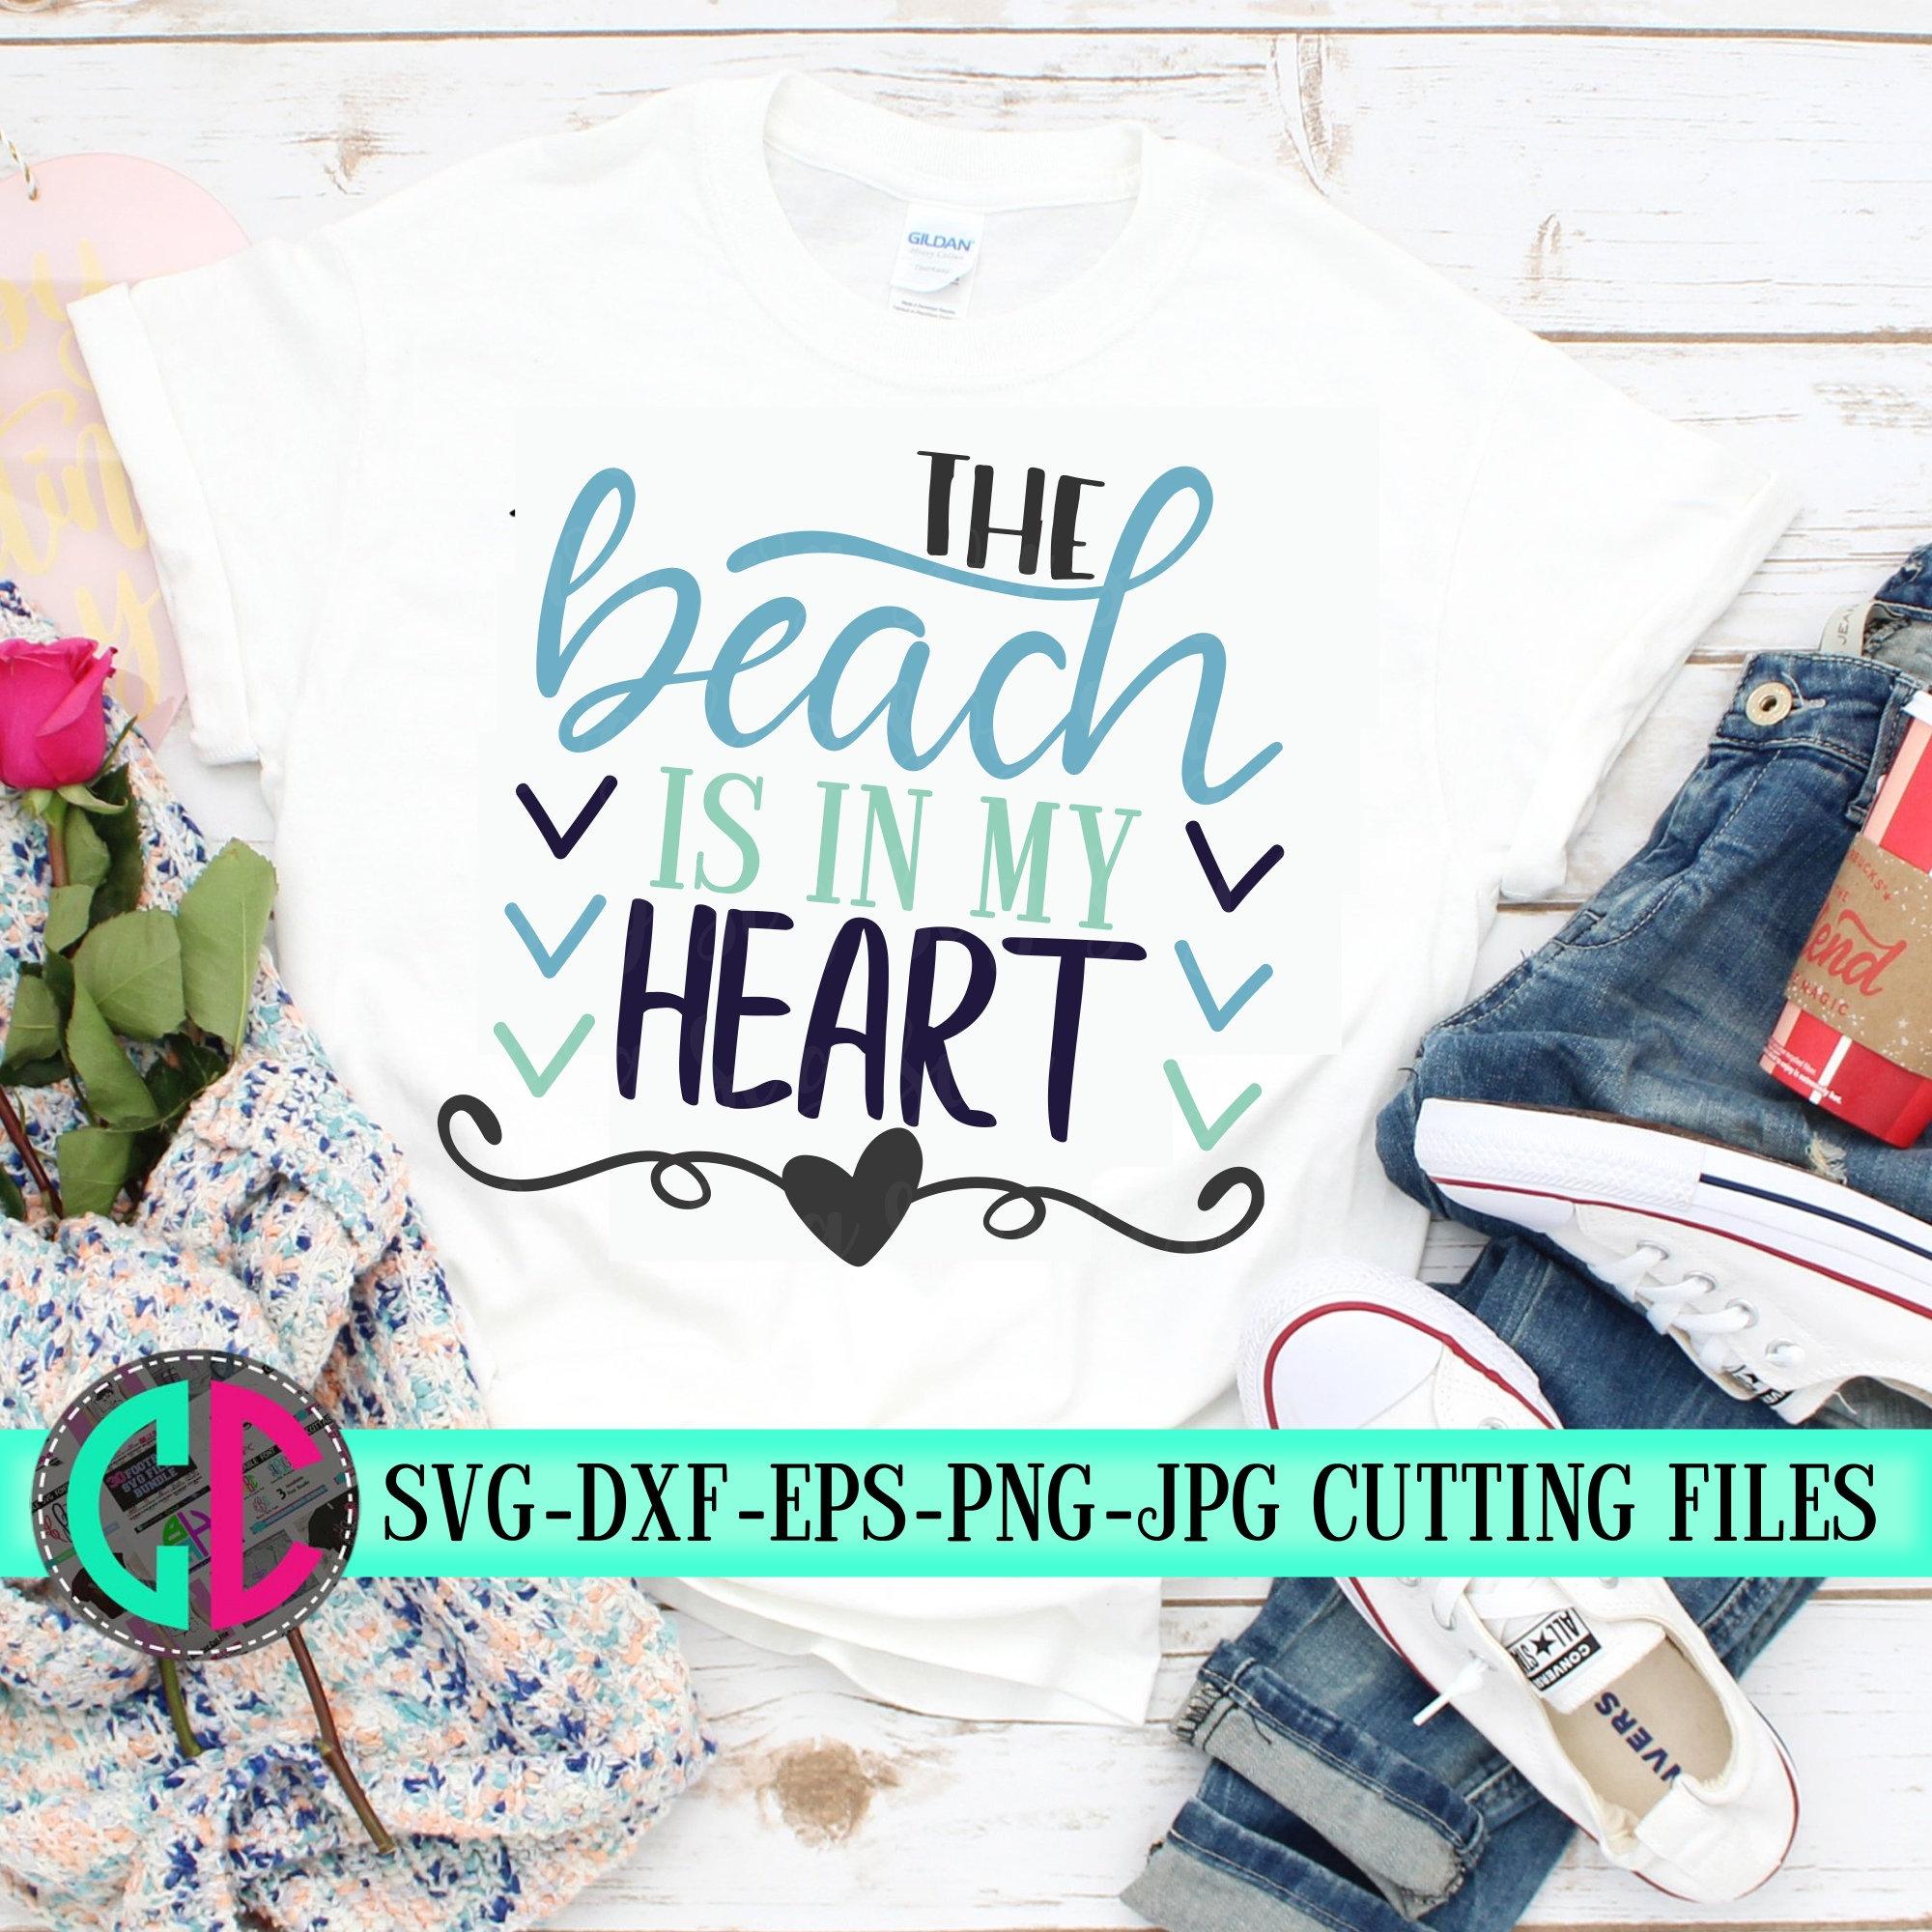 Beach Is In My Heart Svg Summer Svg Summer Quotes Svg Svg Beach Shirts Tshirt Svg Summertime Svg Cricut Designs Silhouette Designs Svg For Cricut